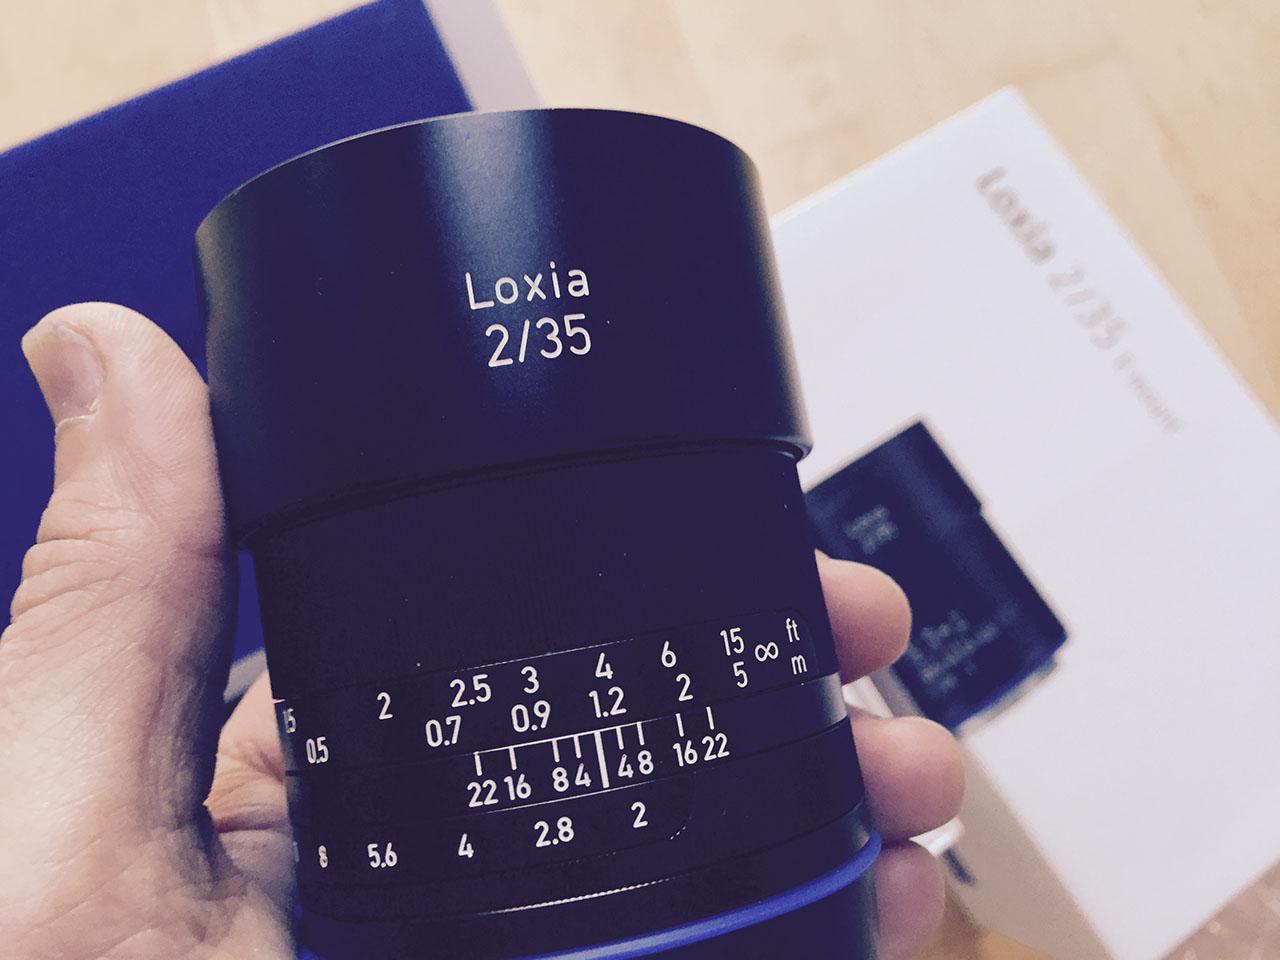 Michael-Wayne_Plant_Loxia 35mm lens markings